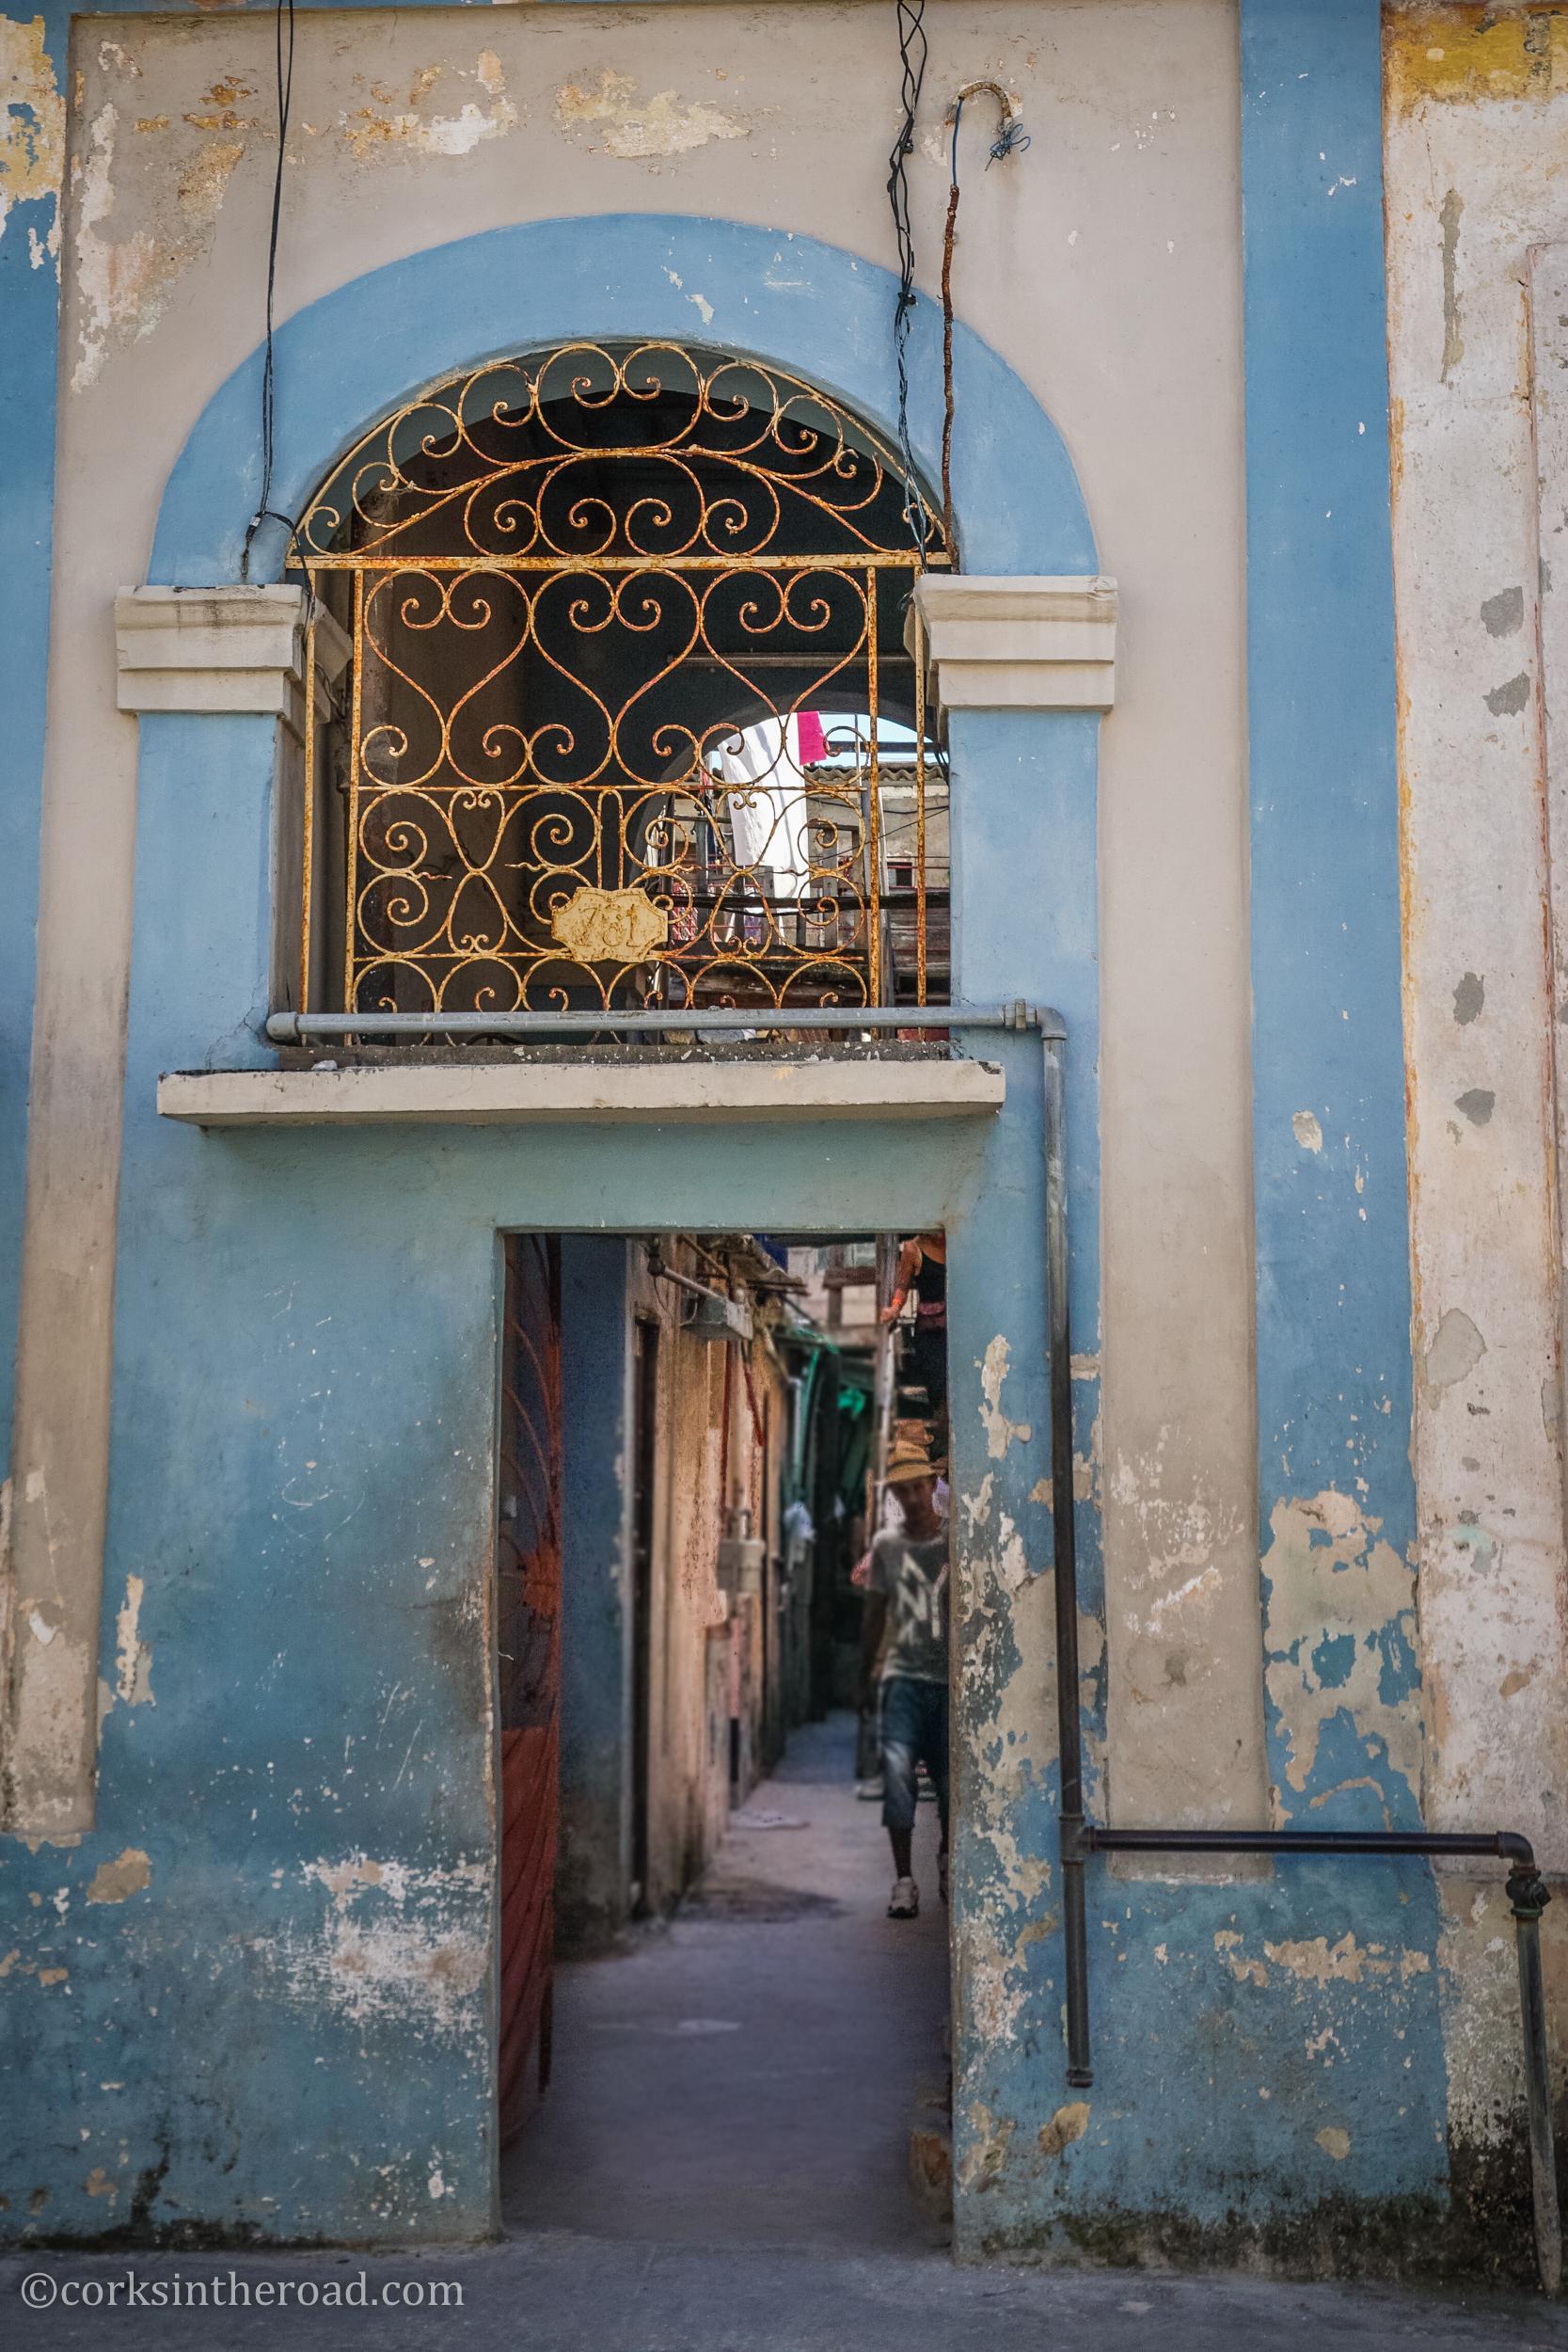 Architecture, Corksintheroad, Cuba, Havana-10.jpg